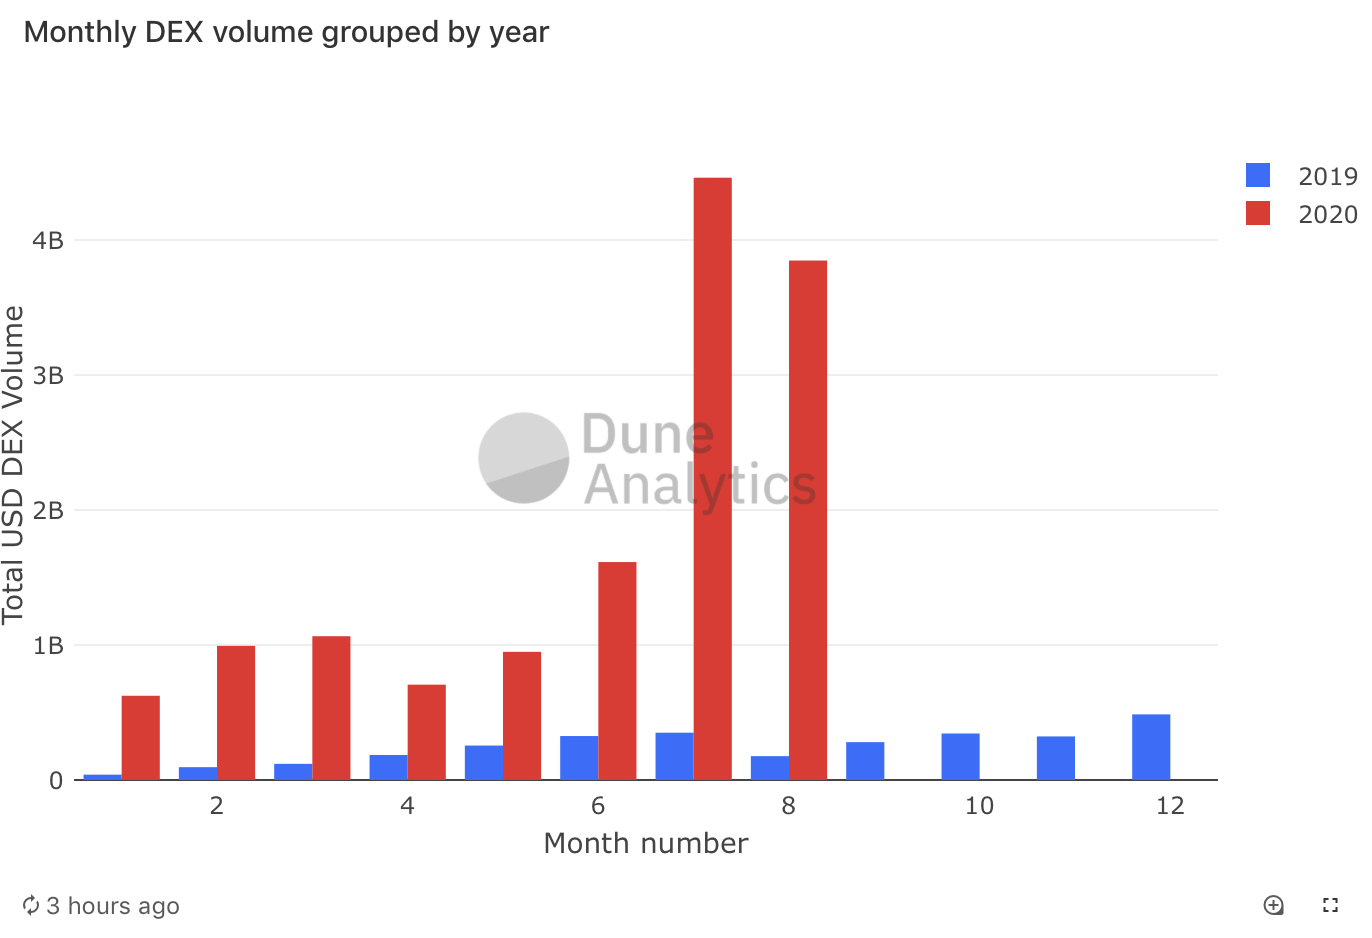 DEX volume 2019 and 2020